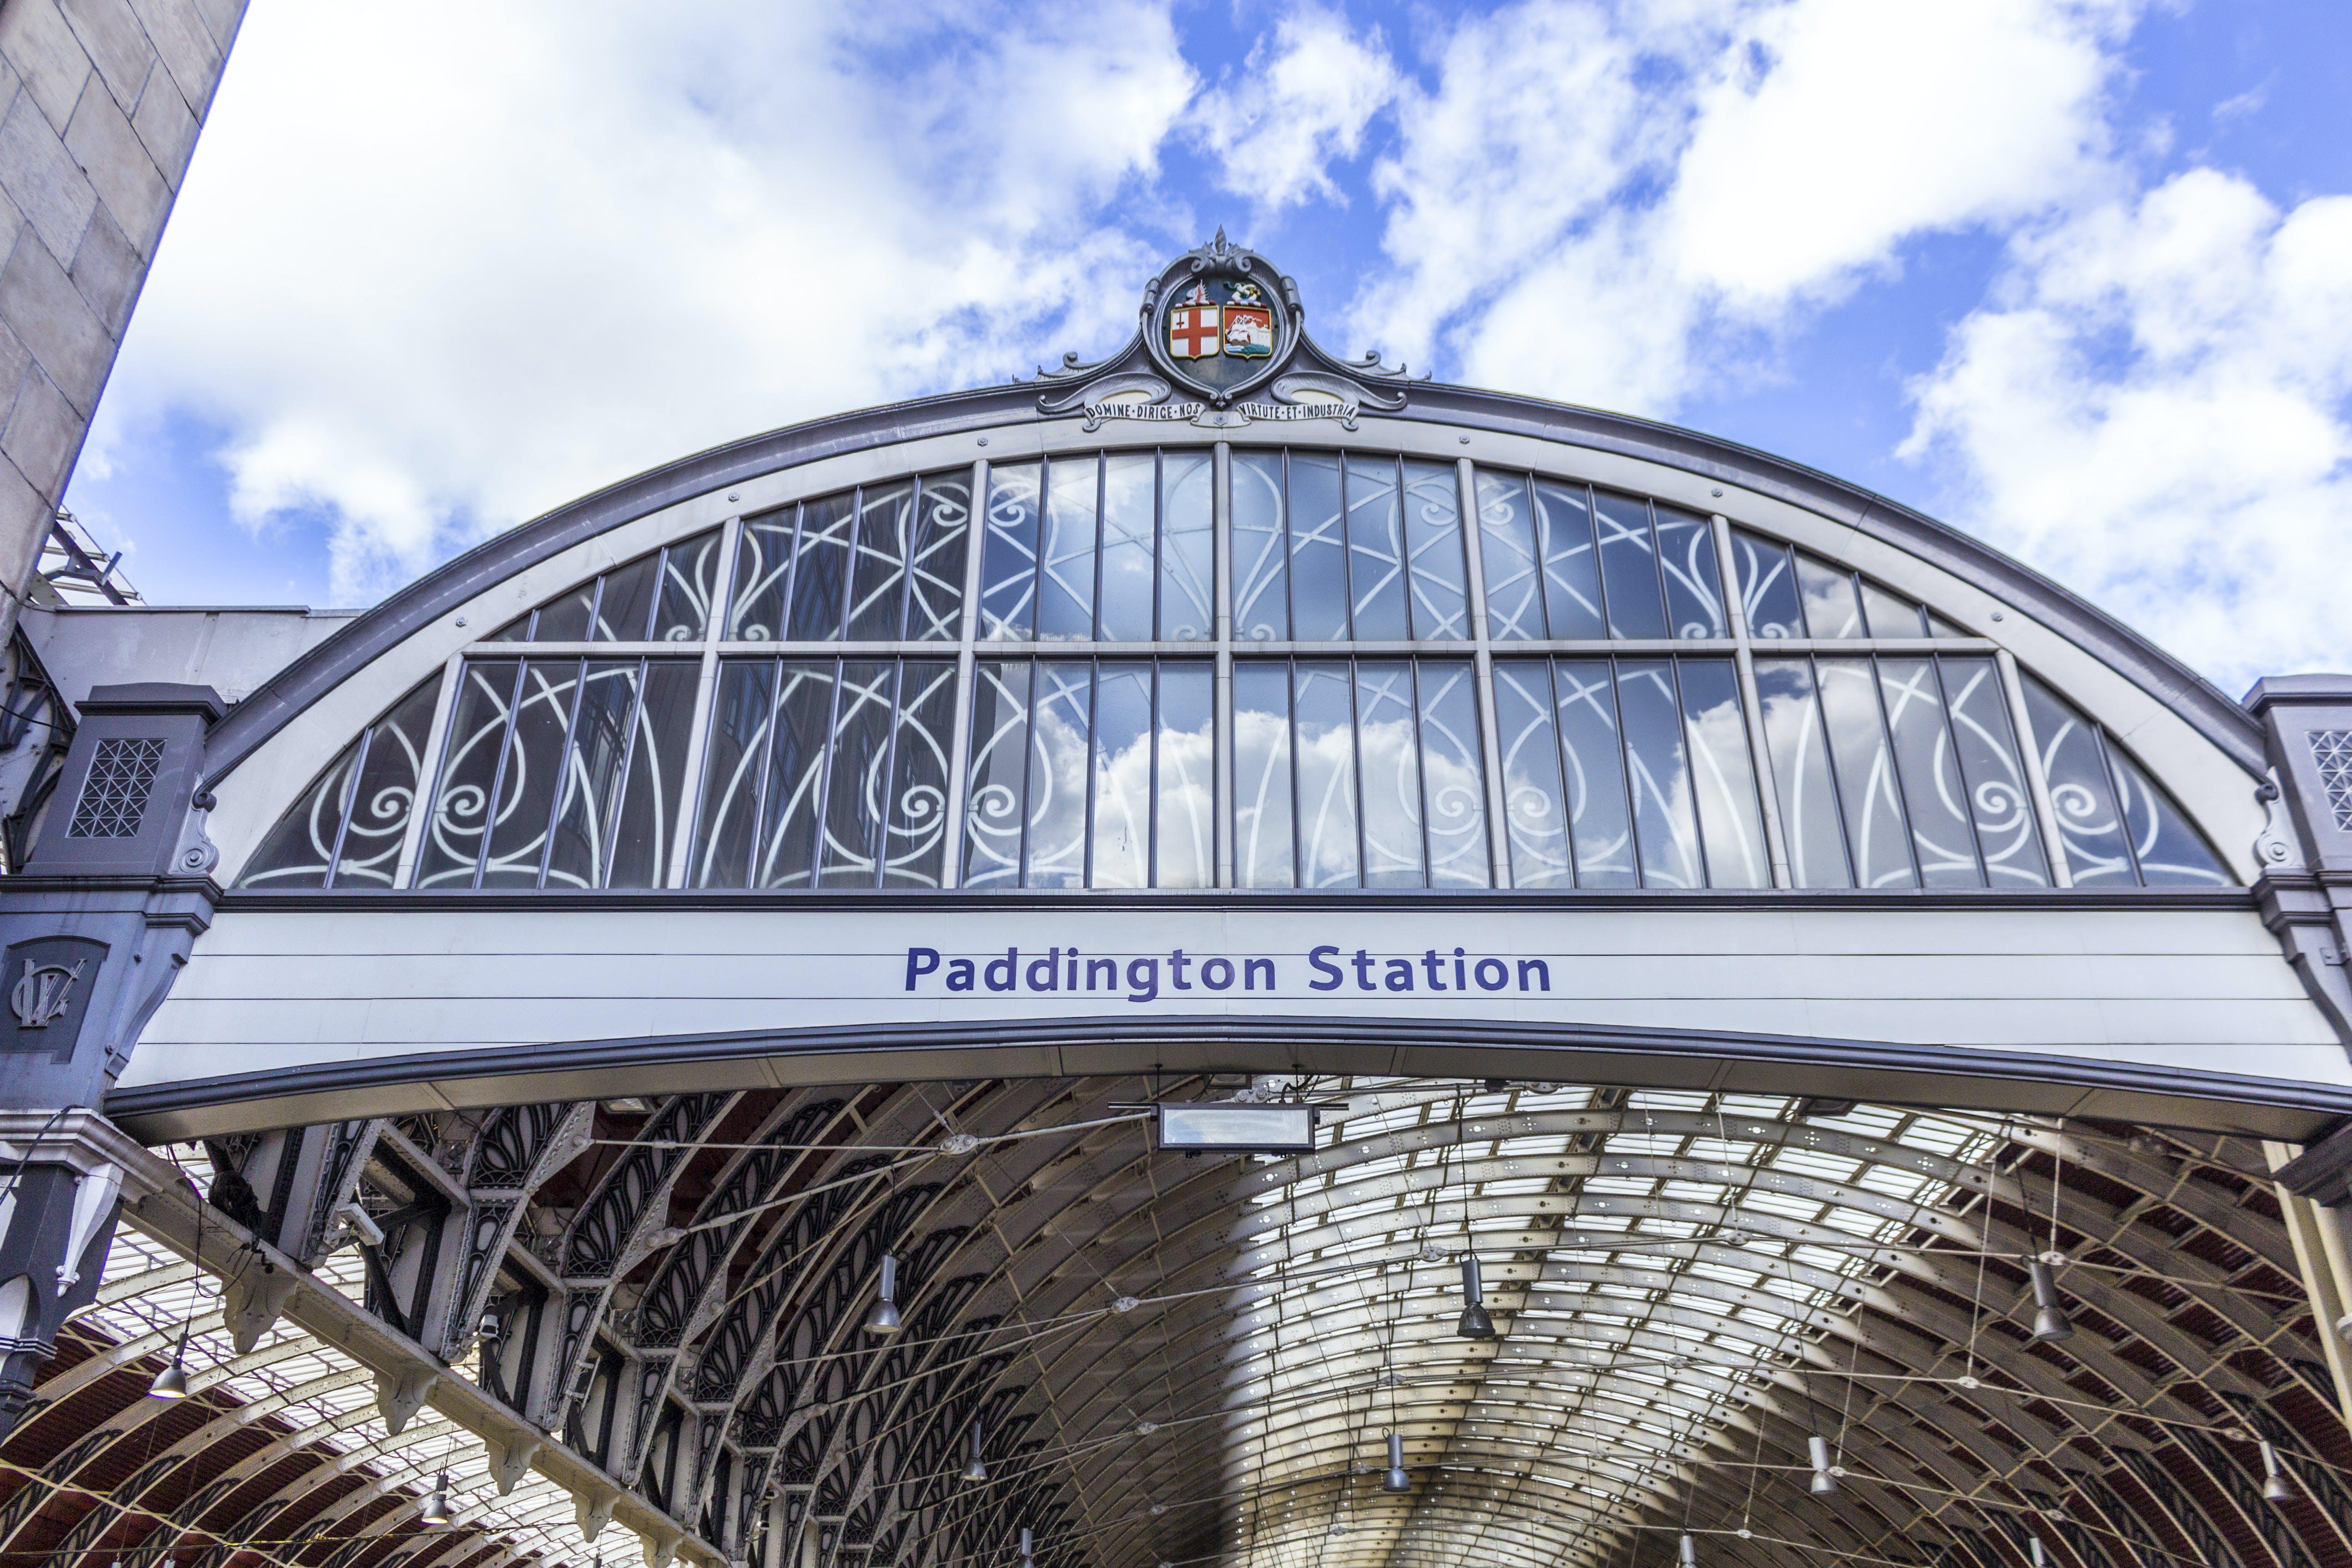 Paddington Station Arch